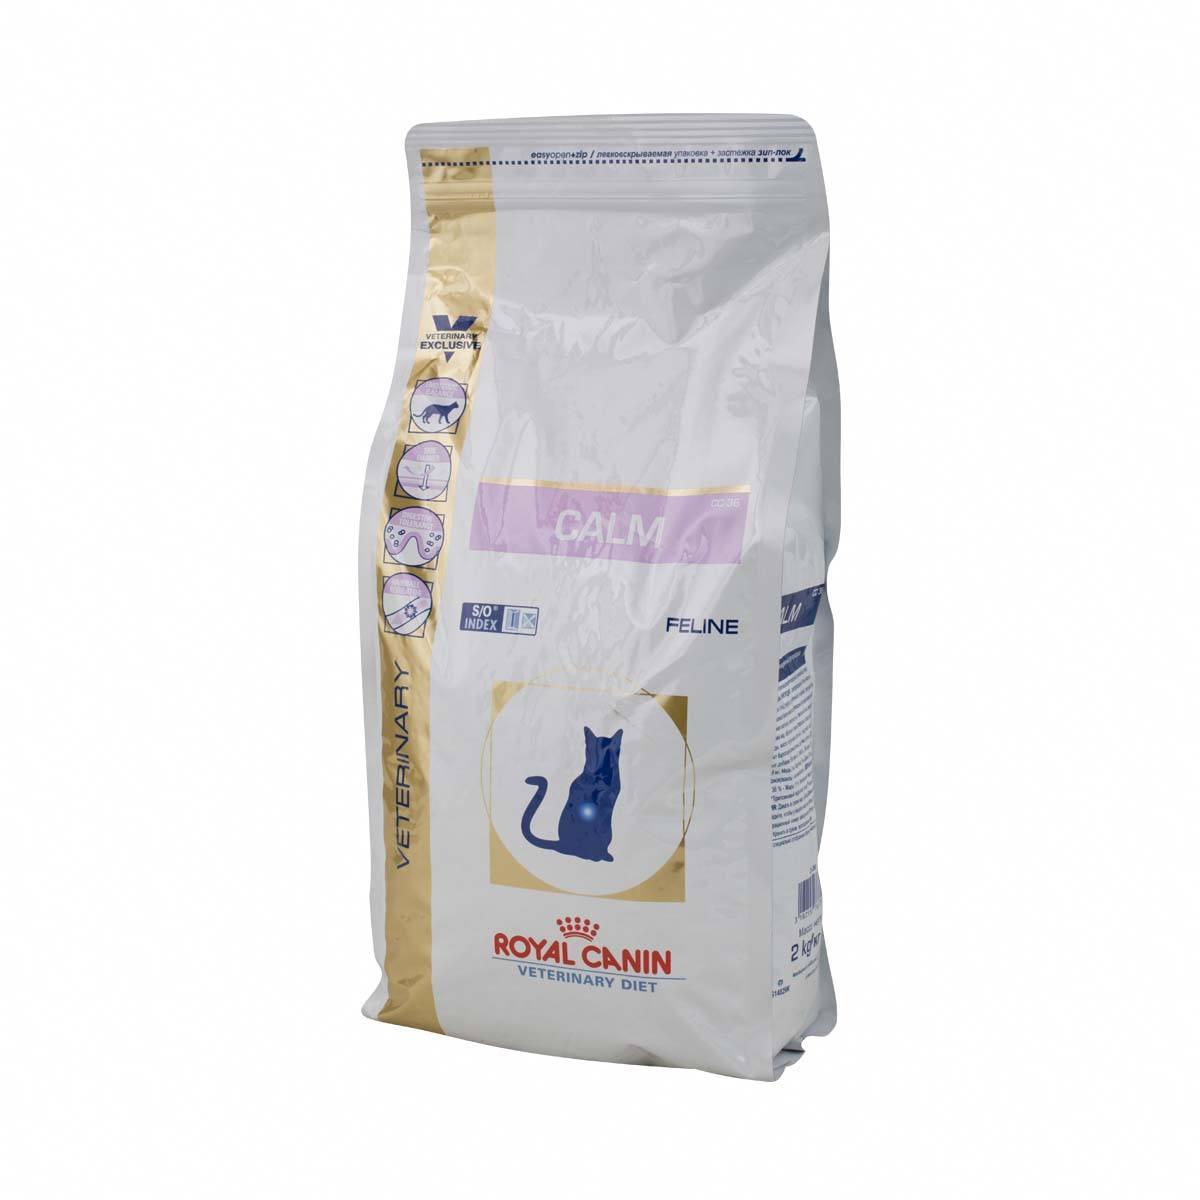 Royal Canin Calm Cat Food Amazon